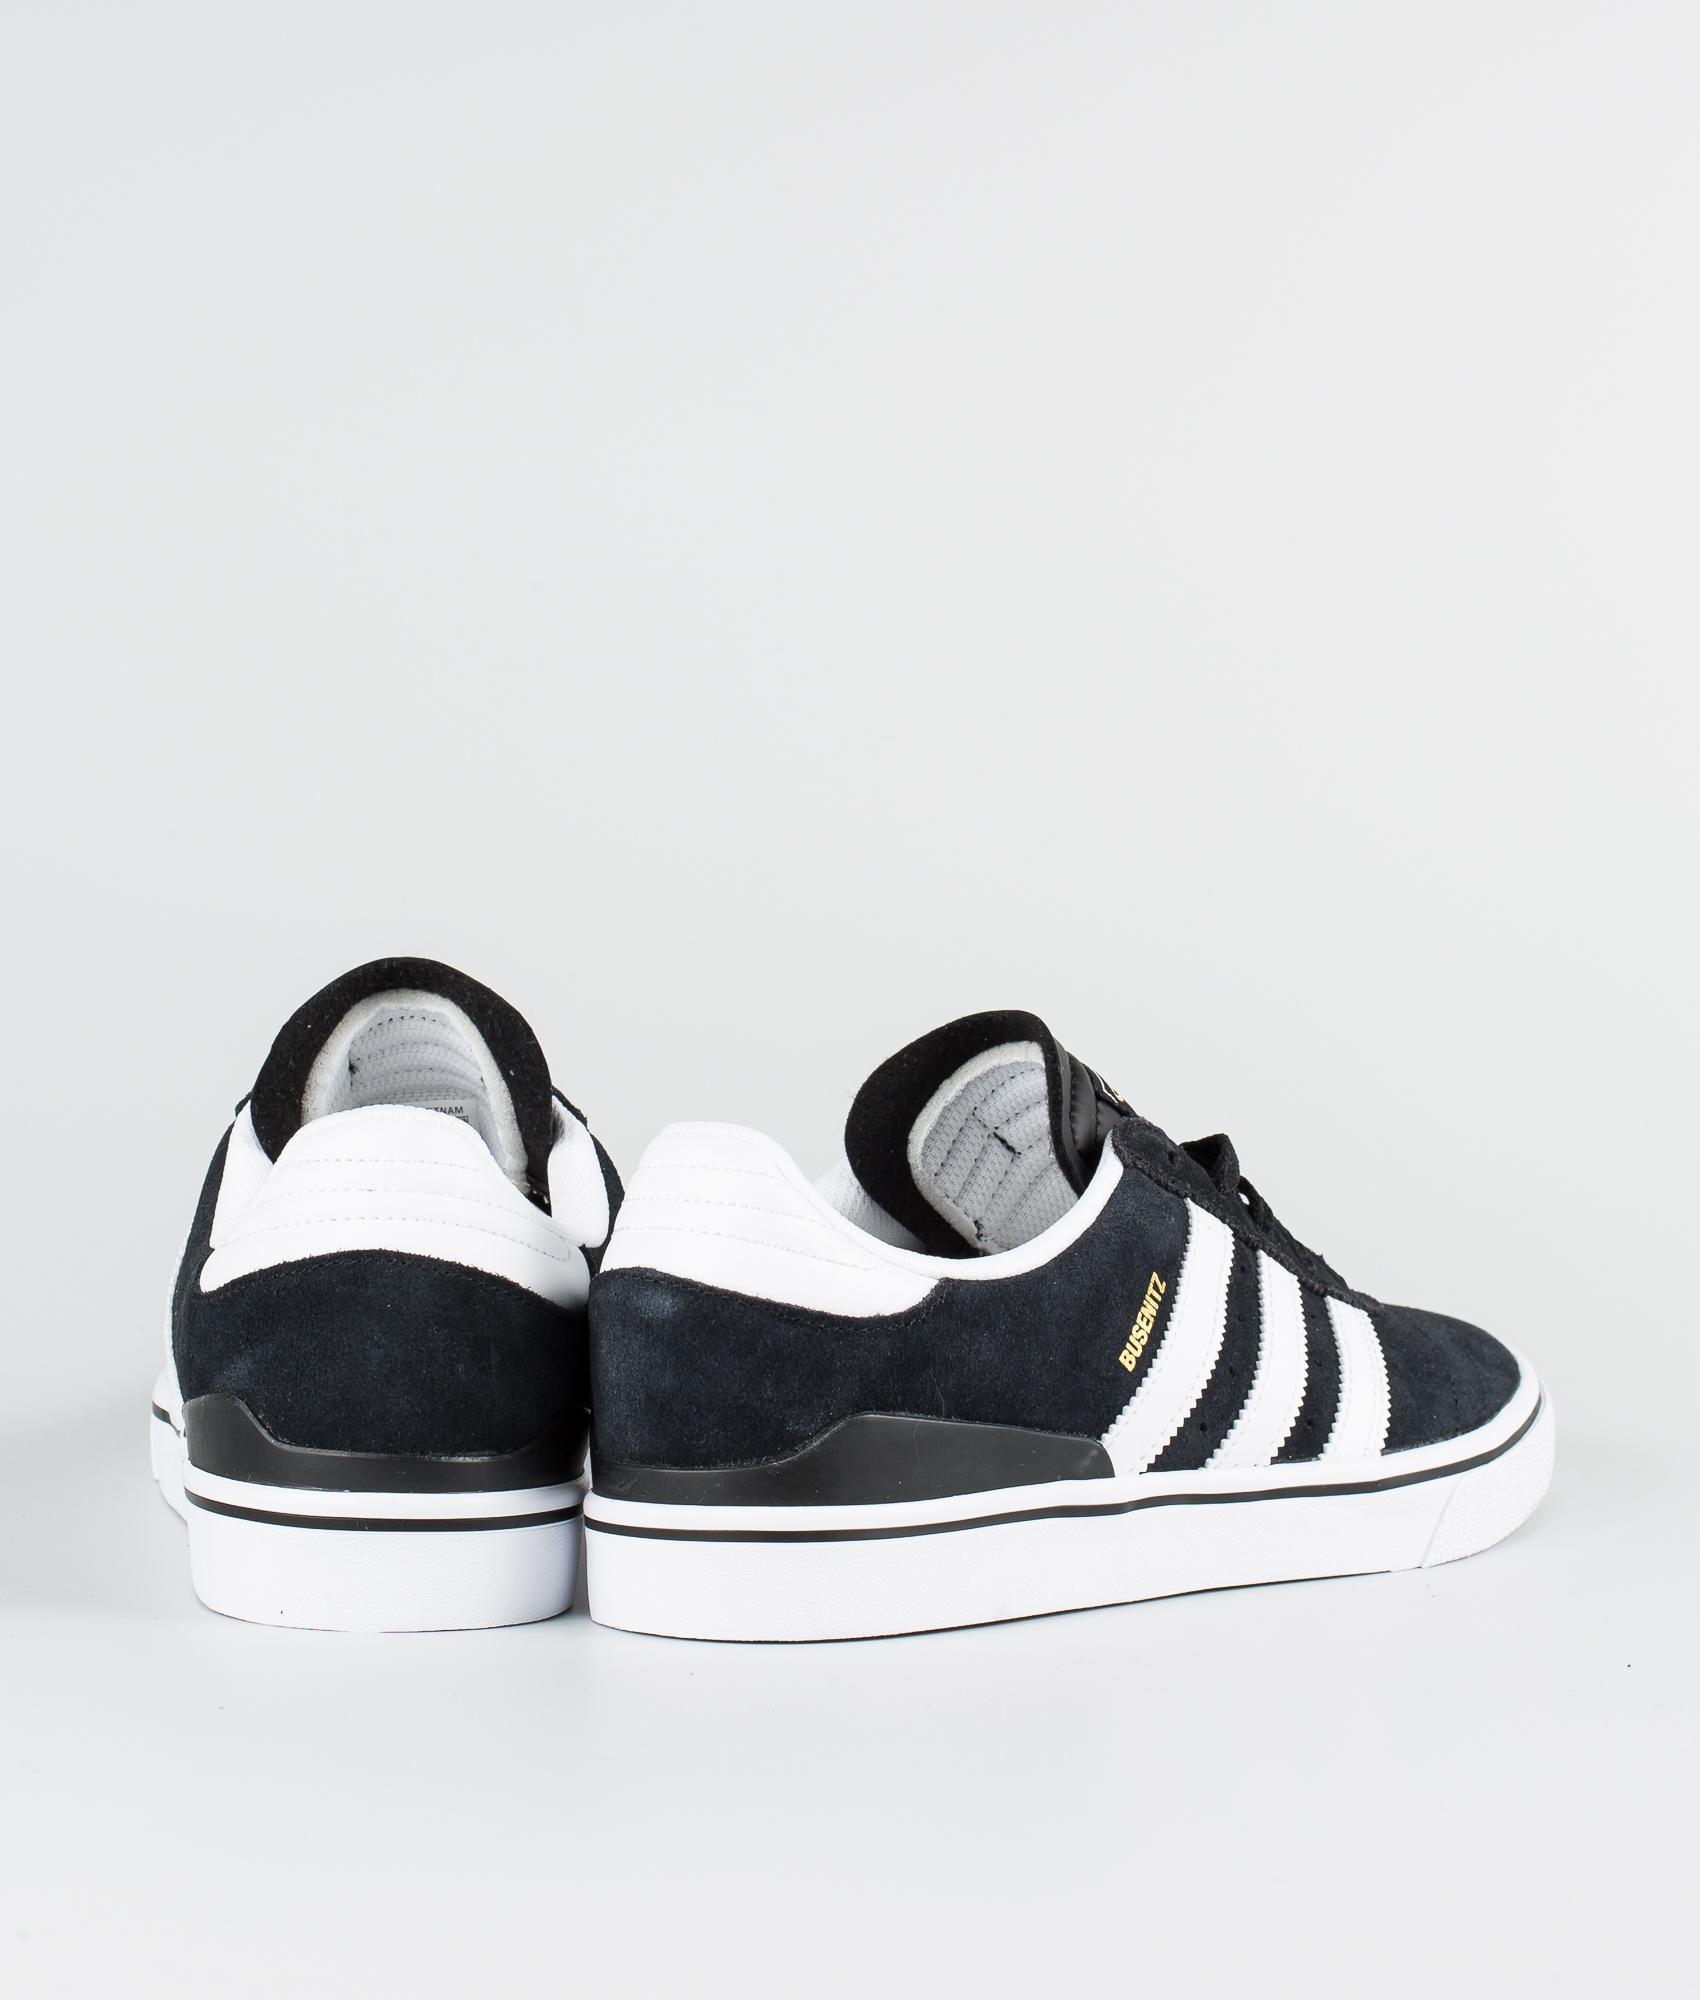 Adidas Skateboarding Busenitz Vulc Scarpe Black1Running